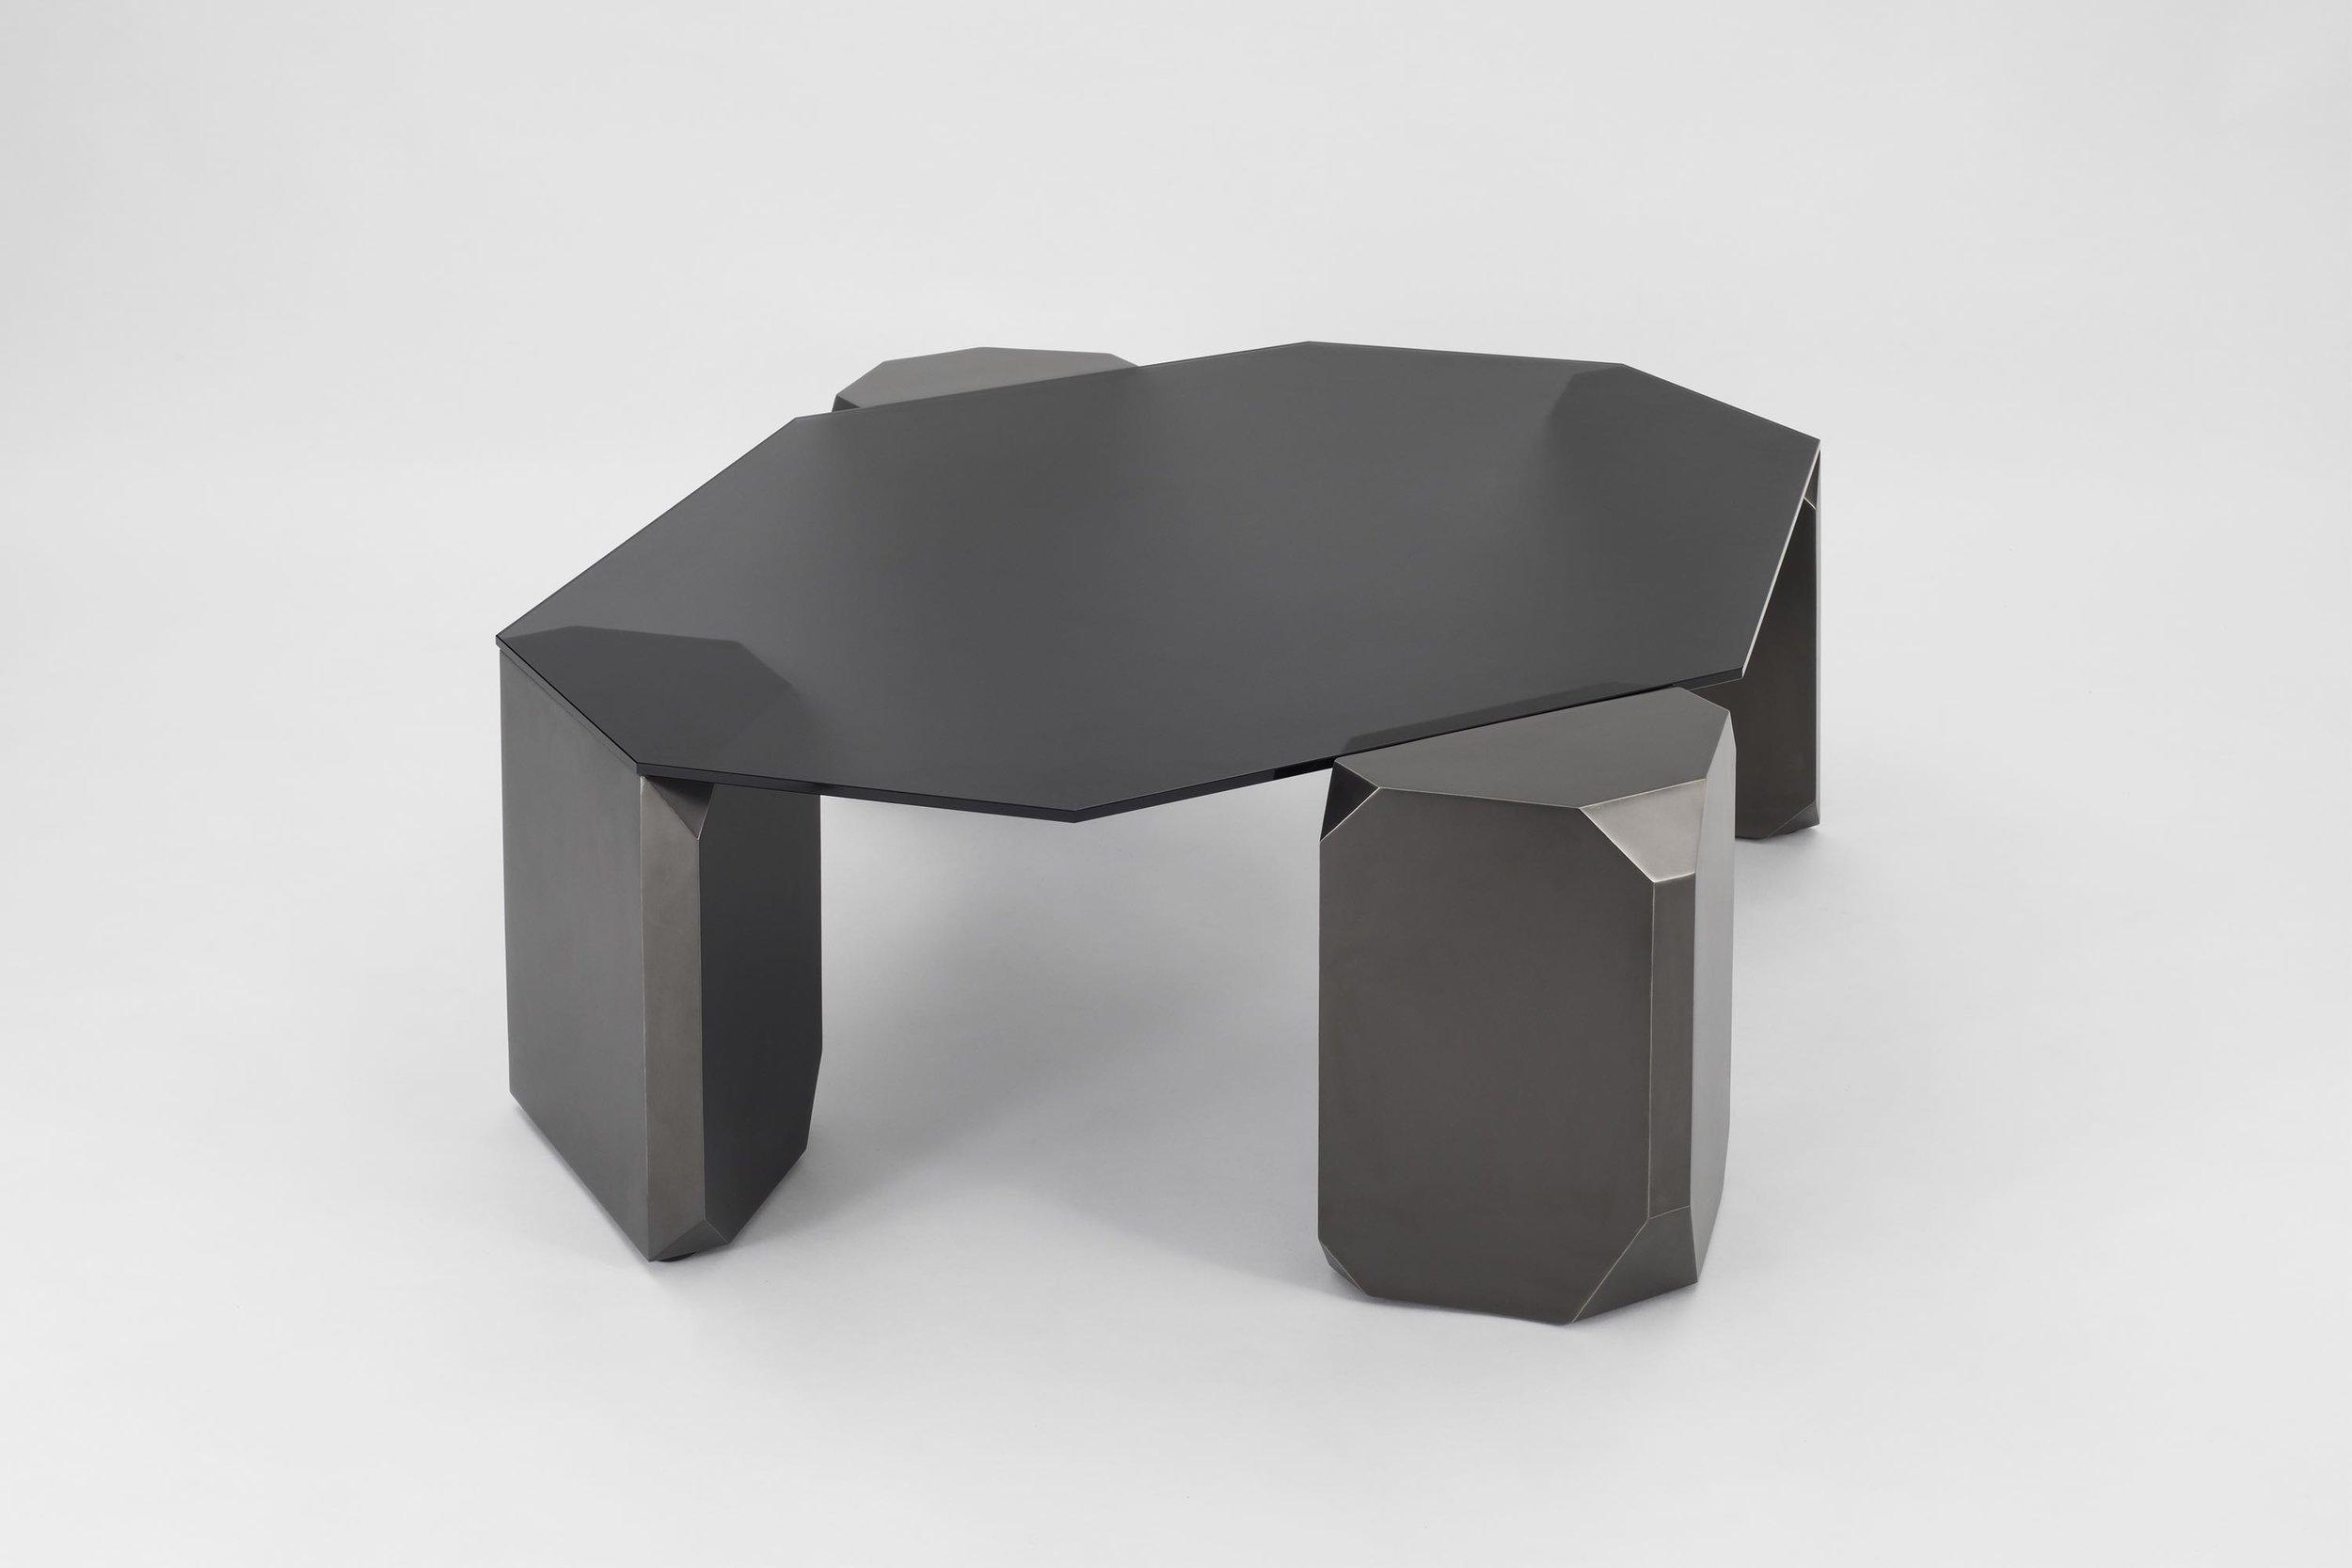 Avram_Rusu_Stonehenge_Coffee_Table_4.jpeg